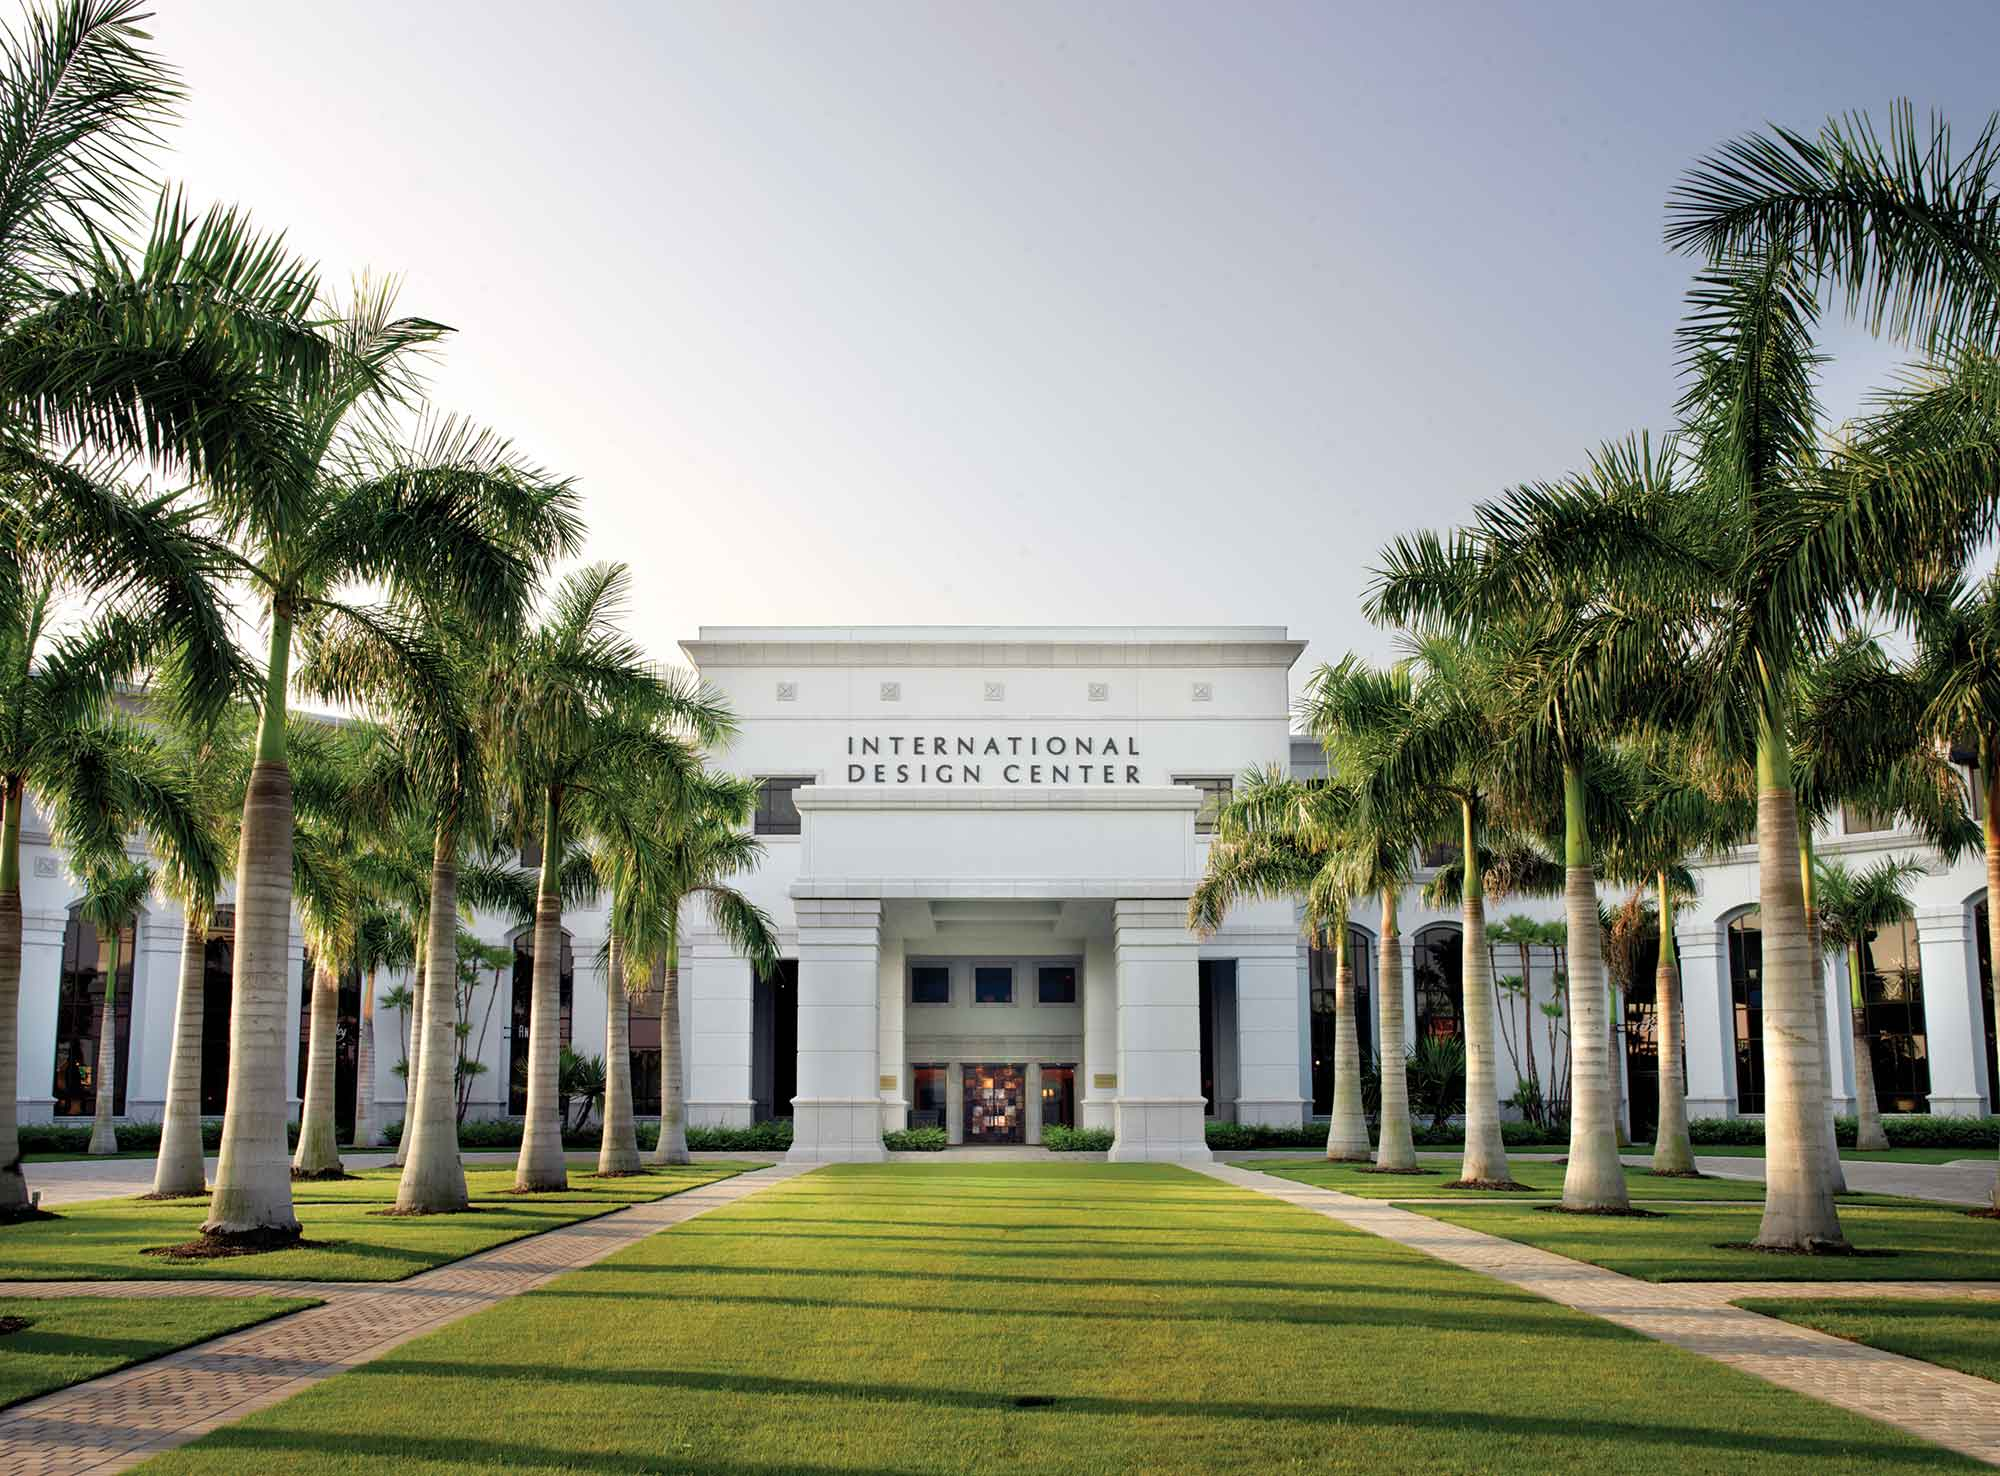 GCM Miromar International Design Center